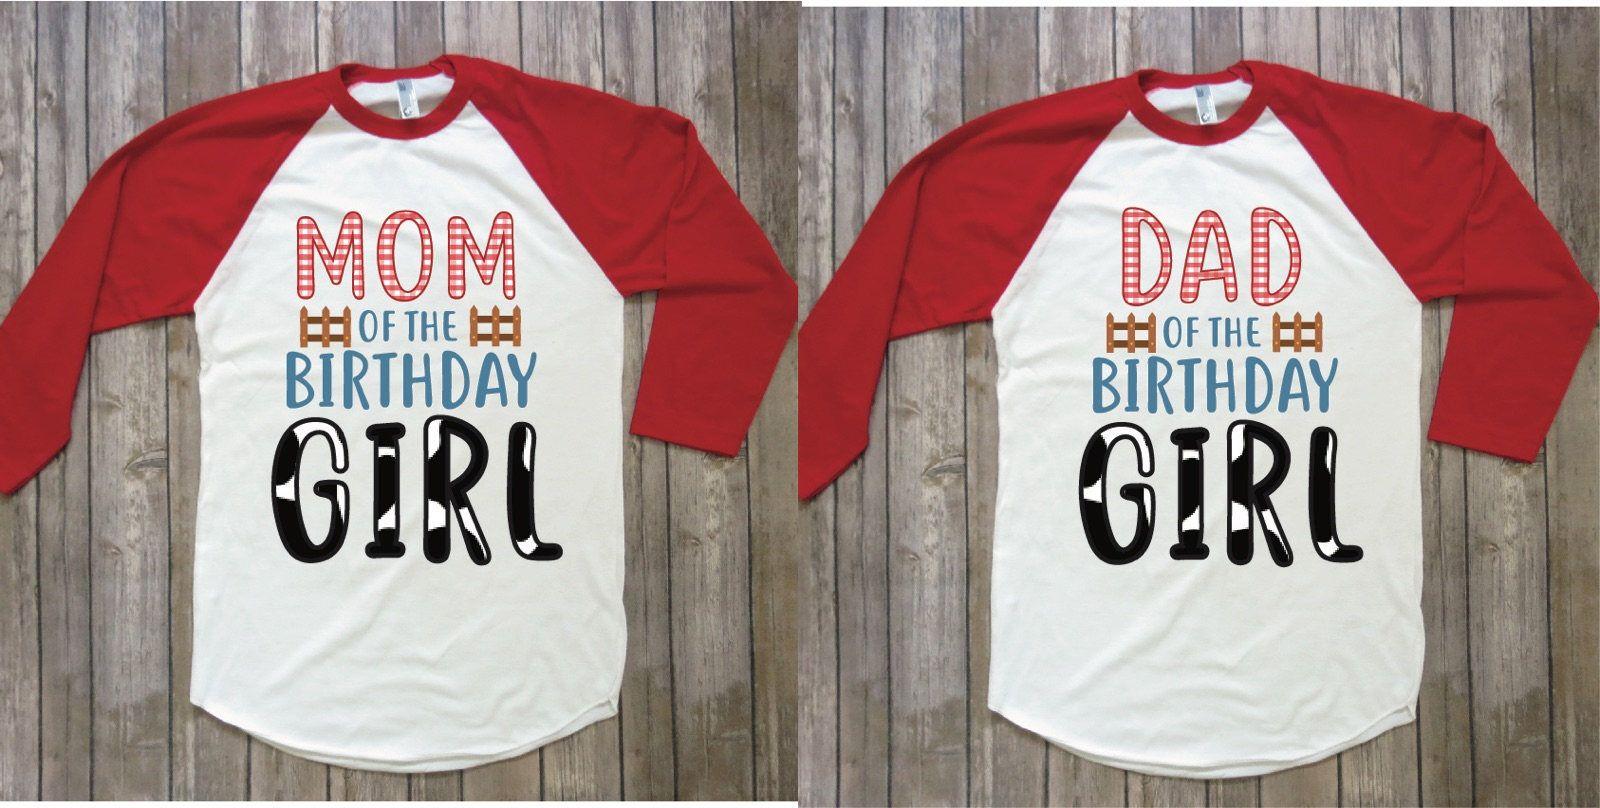 Mom and dad of birthday girl-barnyard version, barnyard parents, farm party, country girl, barnyard birthday party, rustic birthday